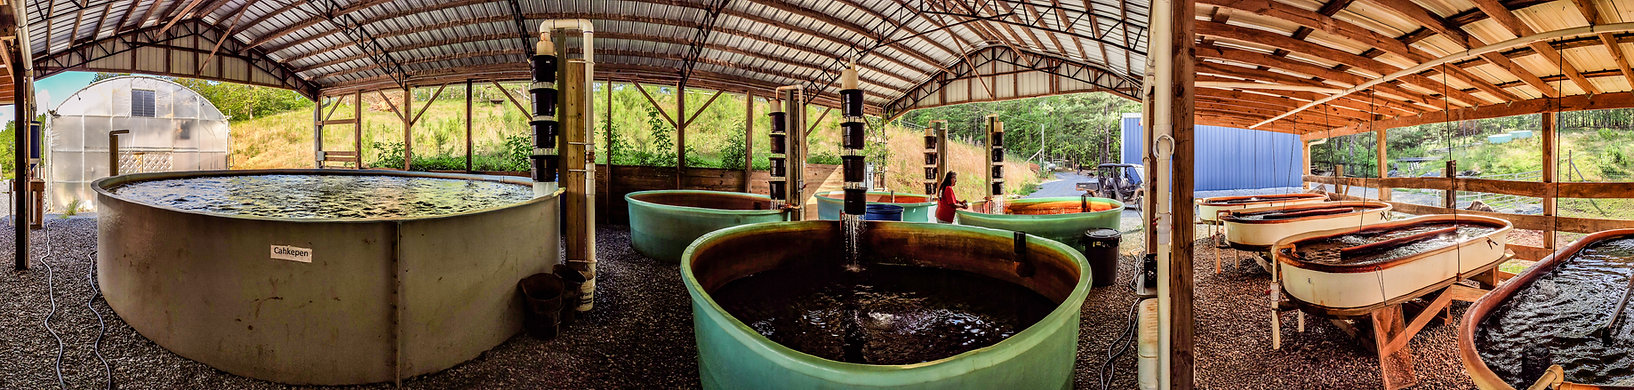 Ekvn-Yefolecv's aquaculture facility and greenhouse